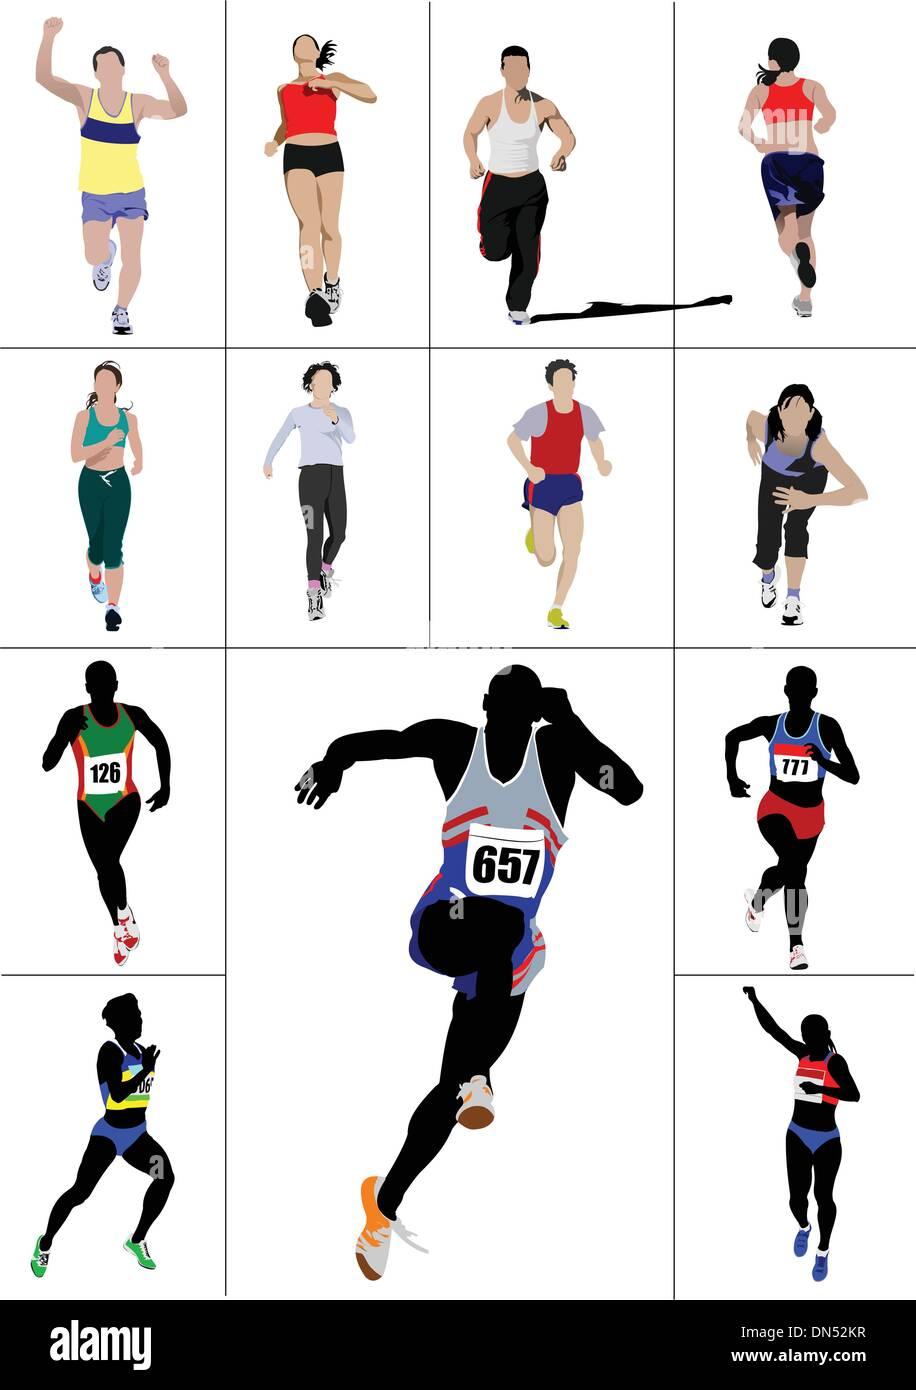 The running men and women. Vector illustration - Stock Vector